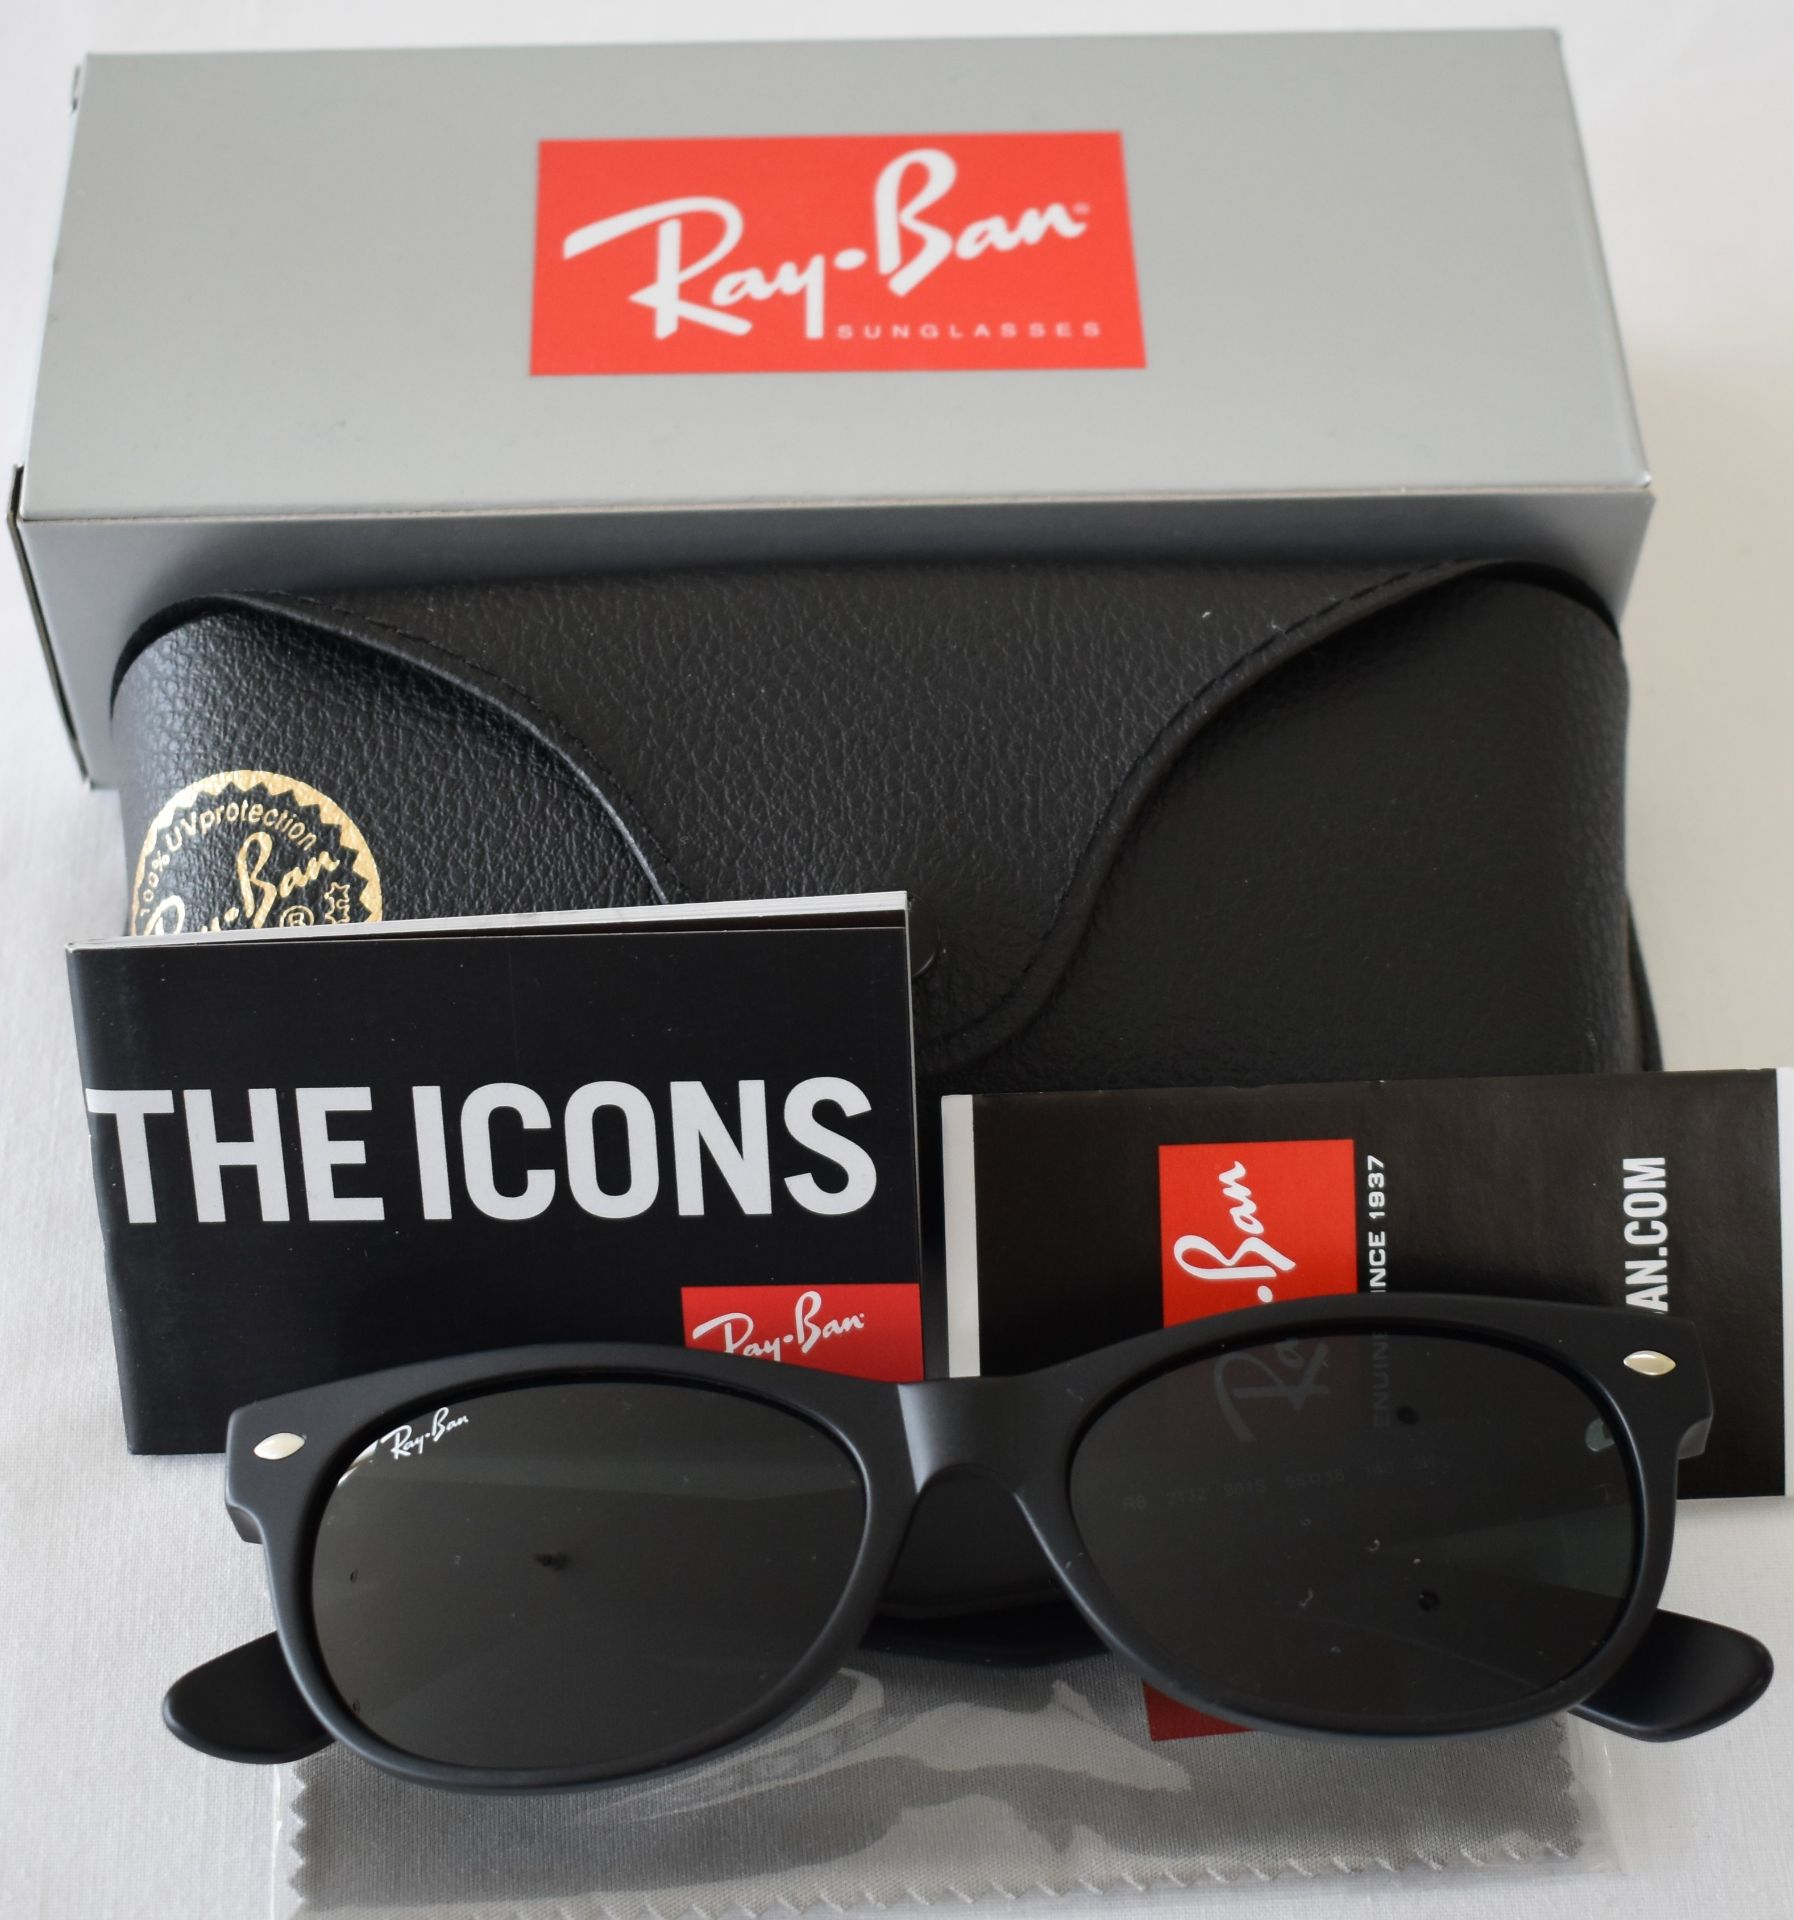 Ray Ban Sunglasses ORB2132 901S *3N - Image 2 of 3